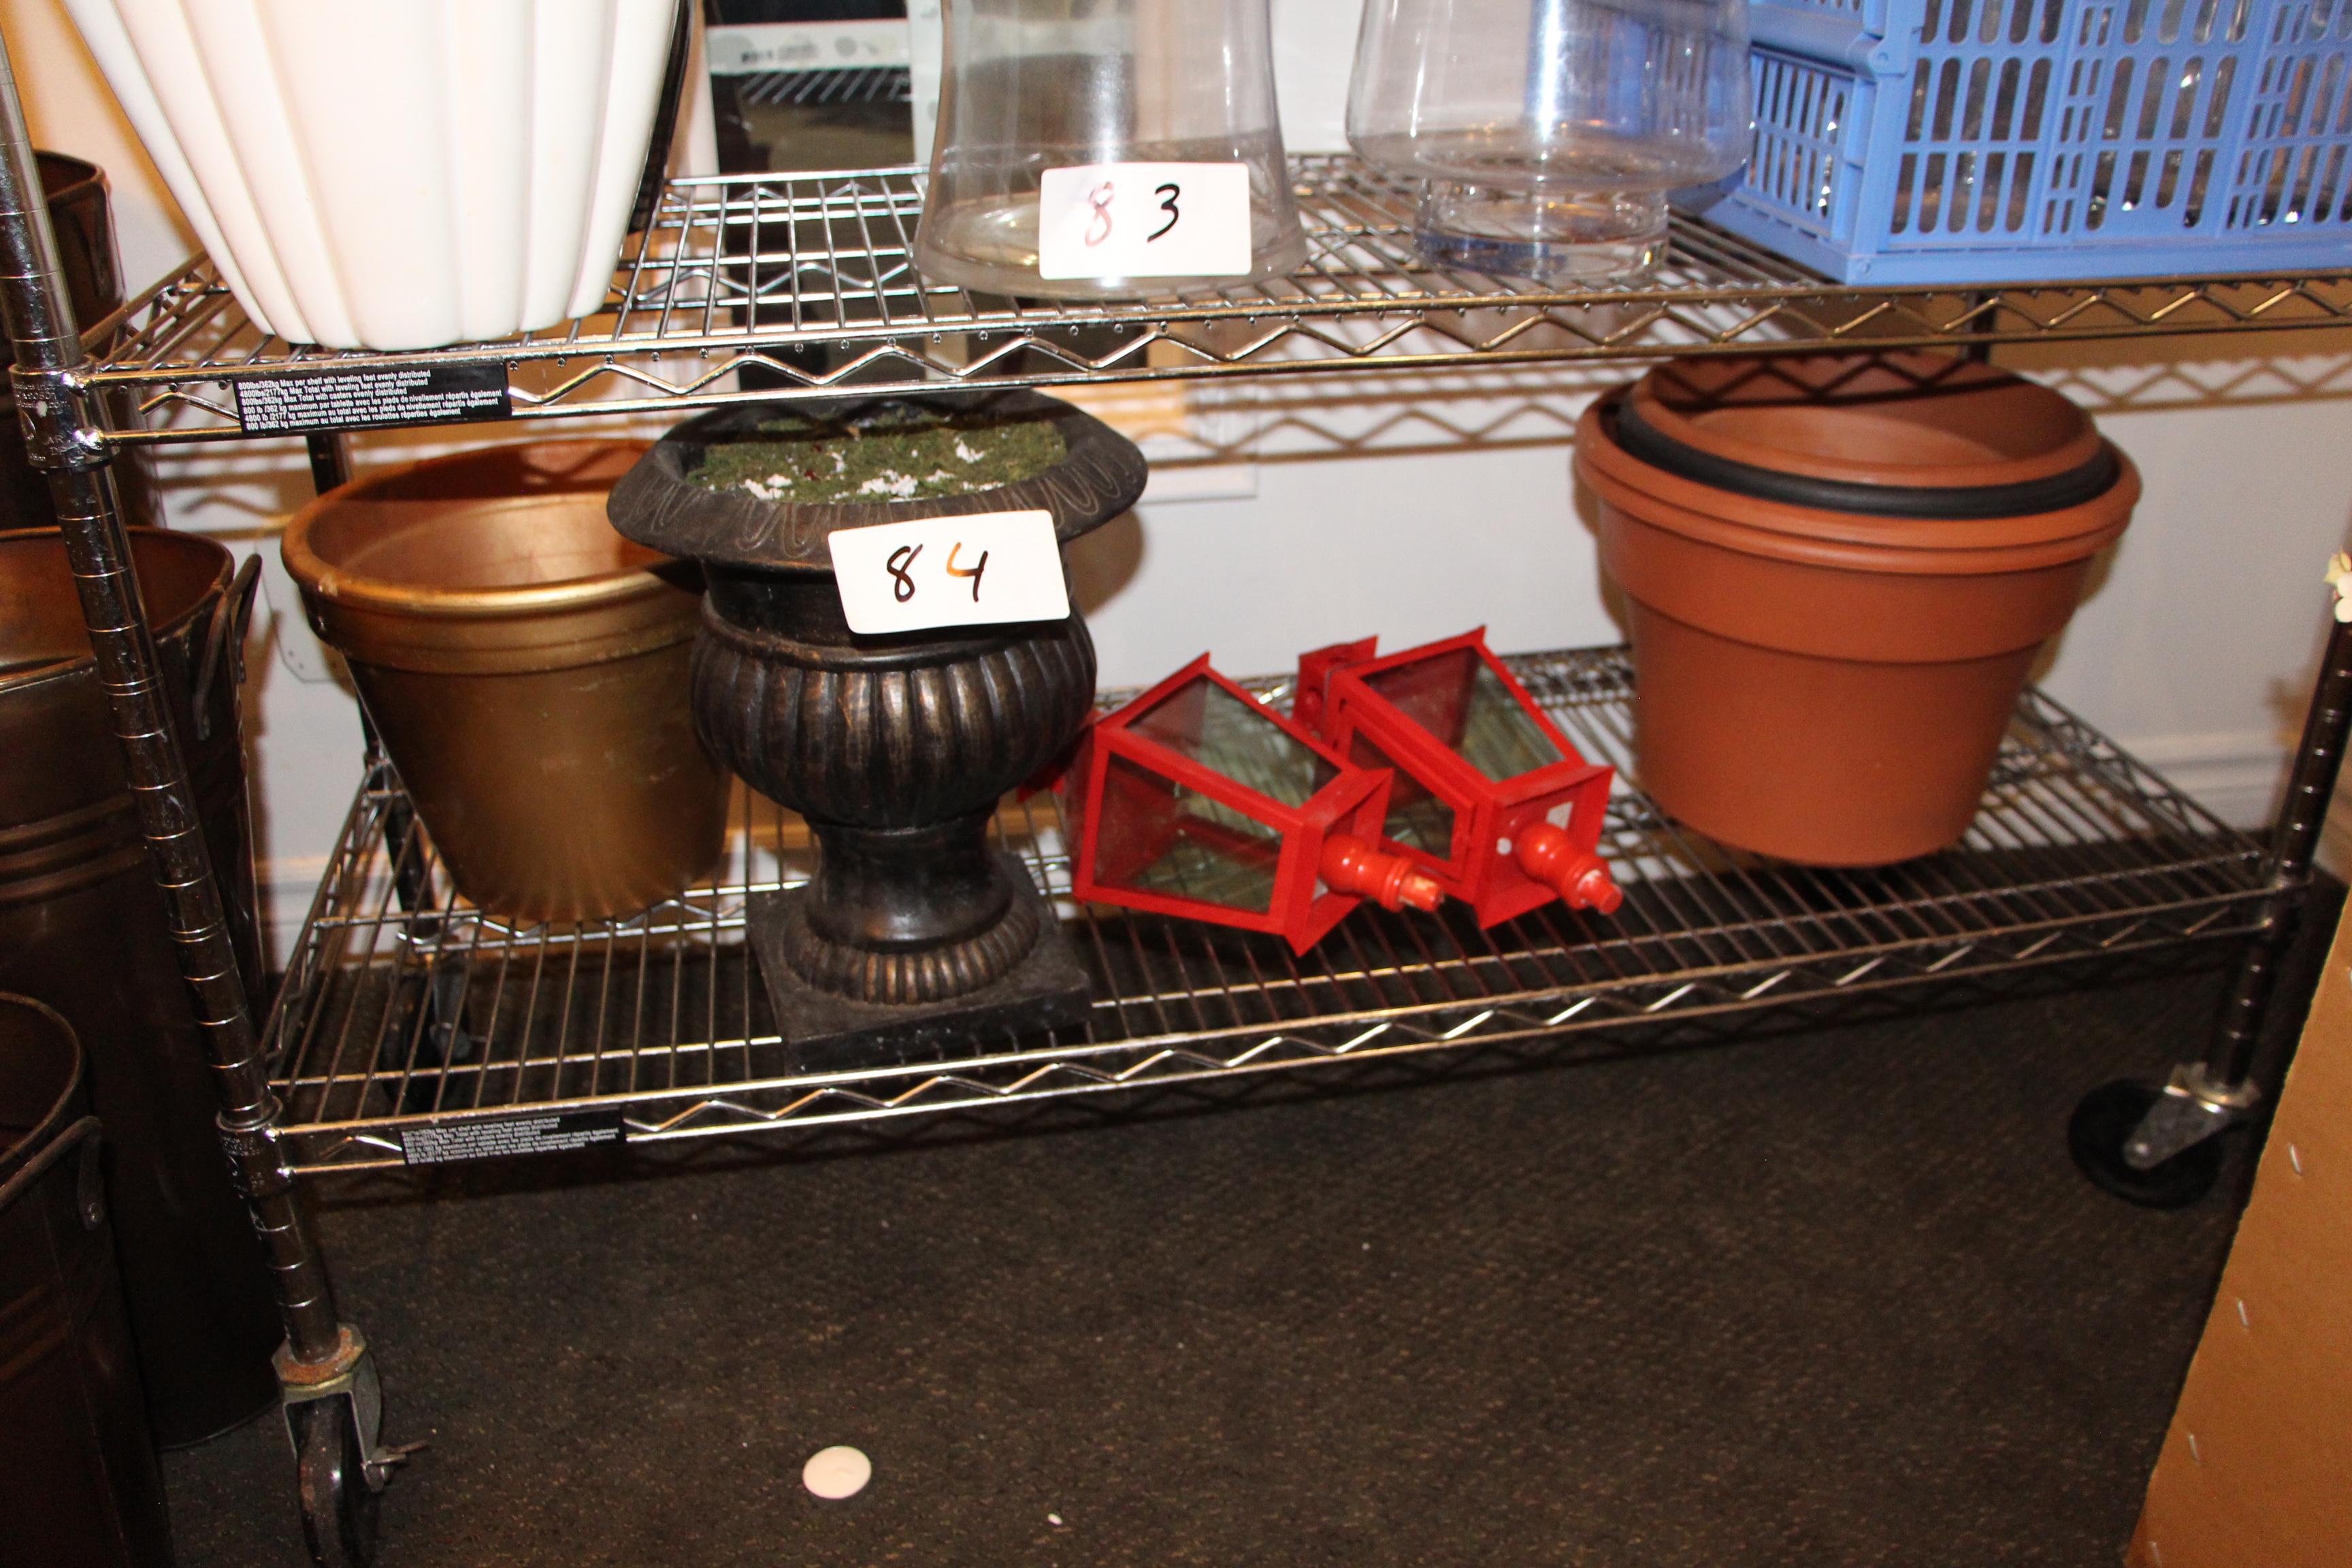 Lot 84 - Lot assorted flower pots and lanterns on shelf